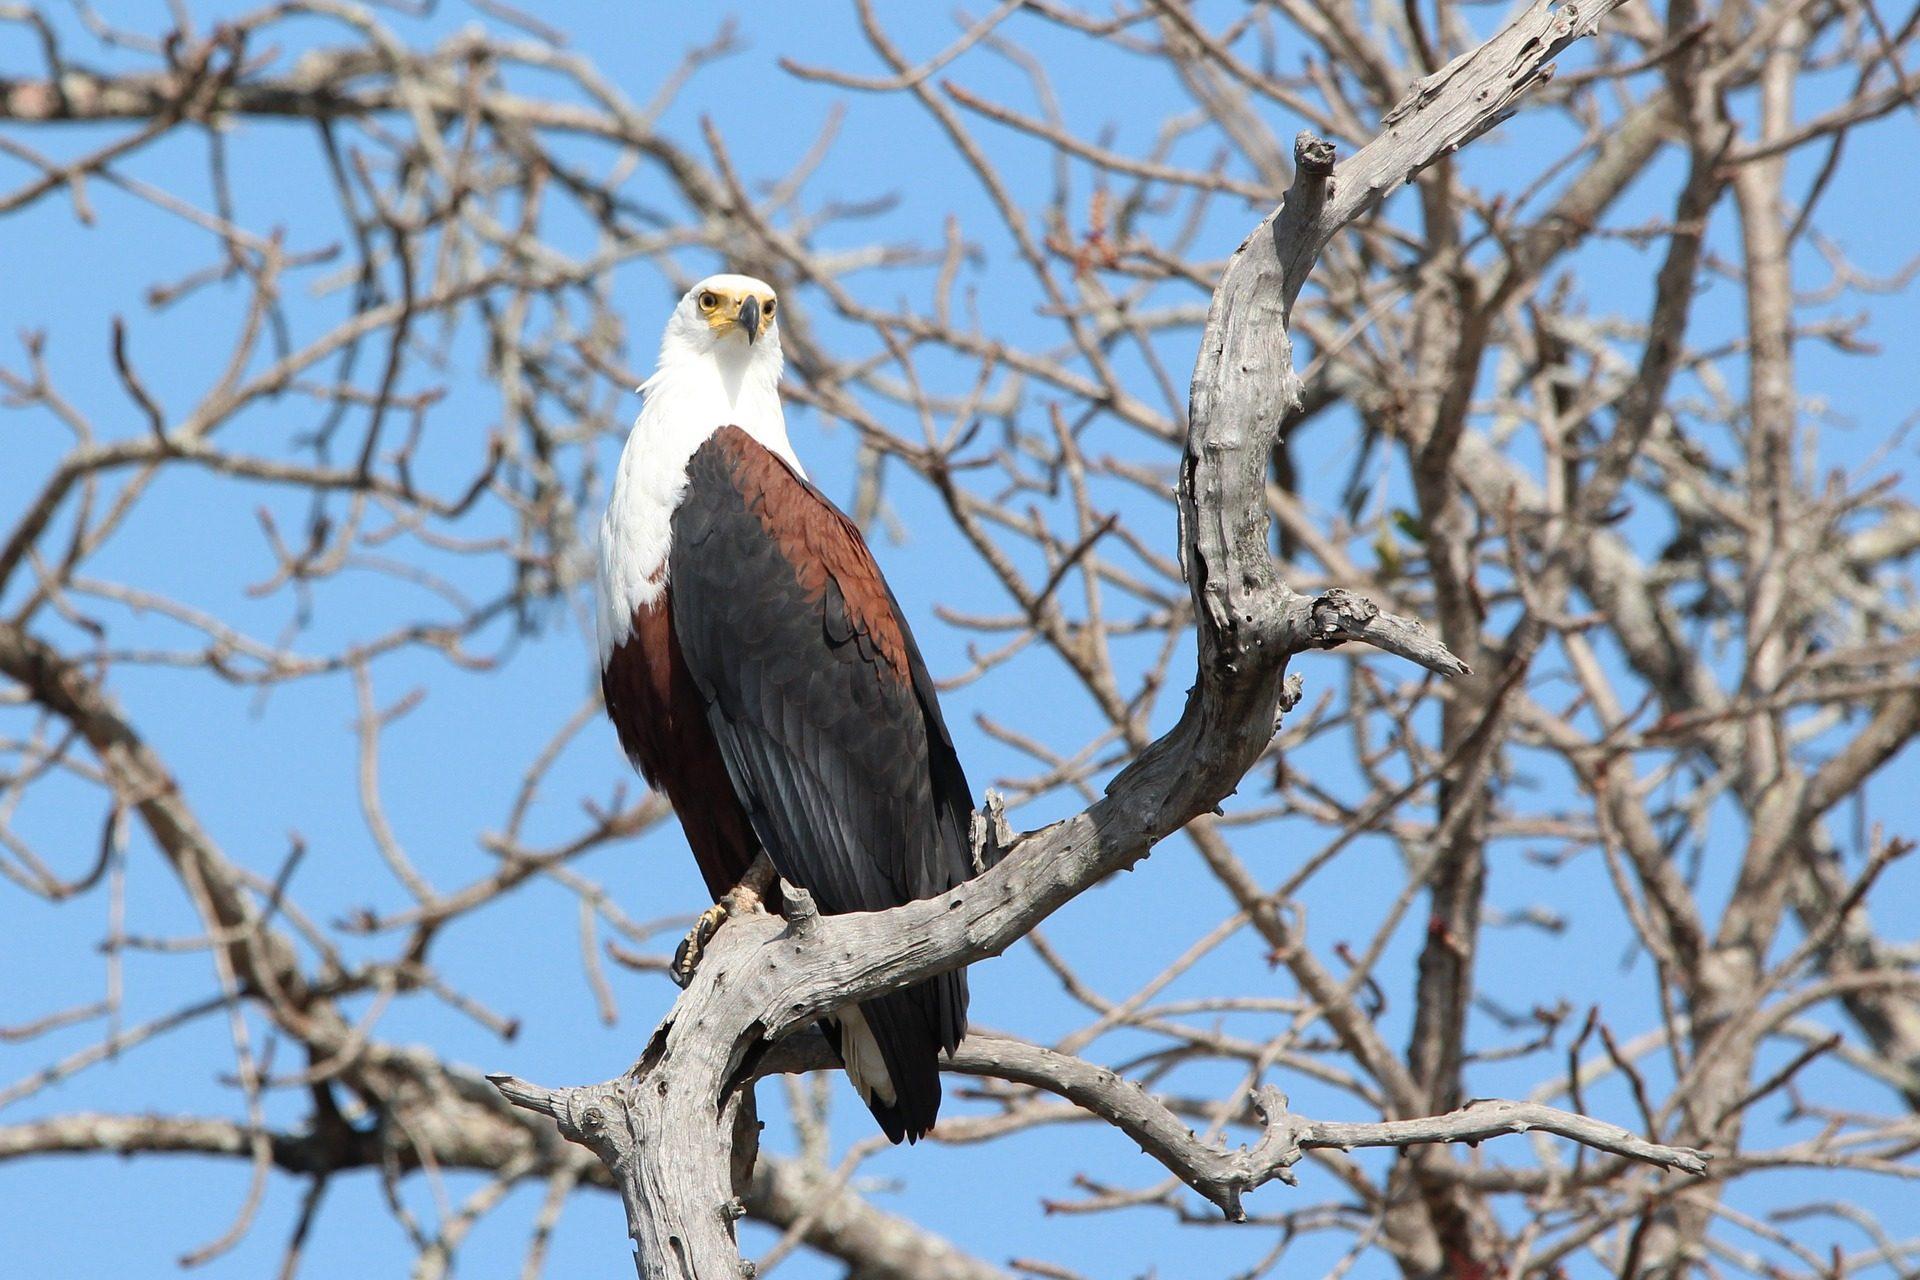 Eagle, Ave, ramo, árbol, piumaggio - Sfondi HD - Professor-falken.com